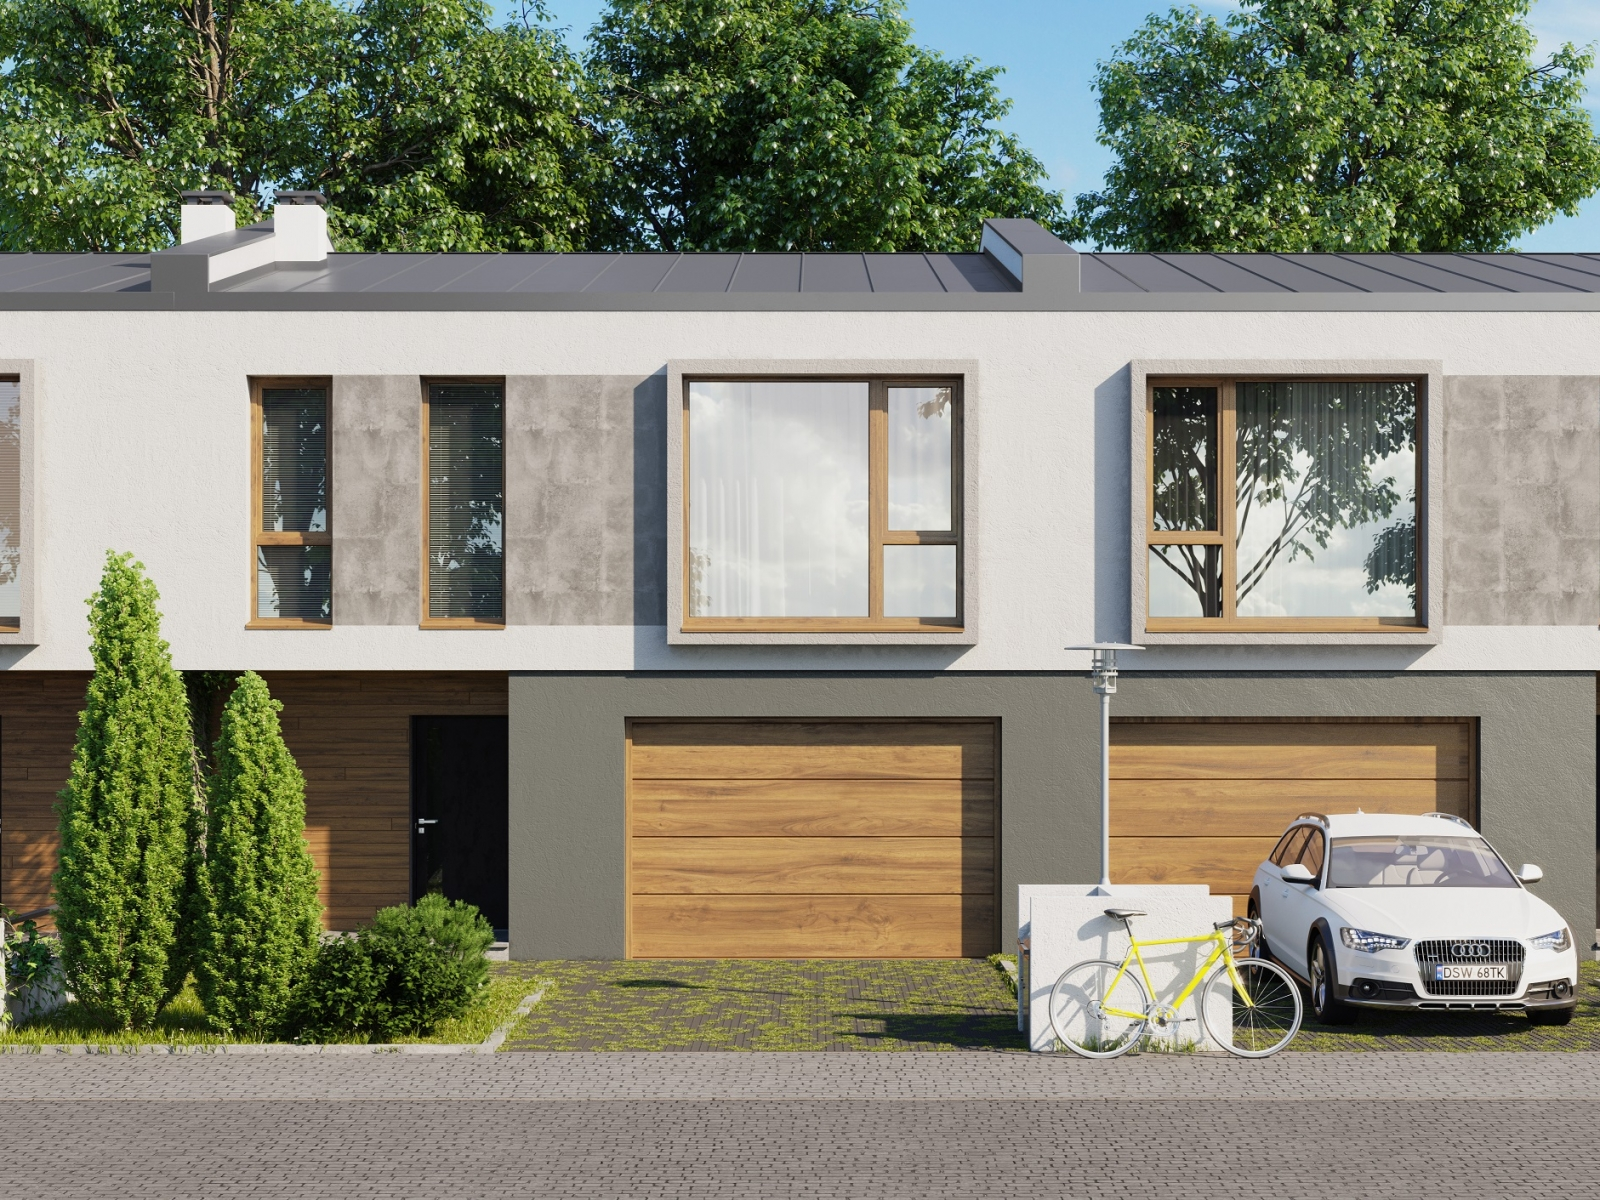 Sunny Townhouse Visualization